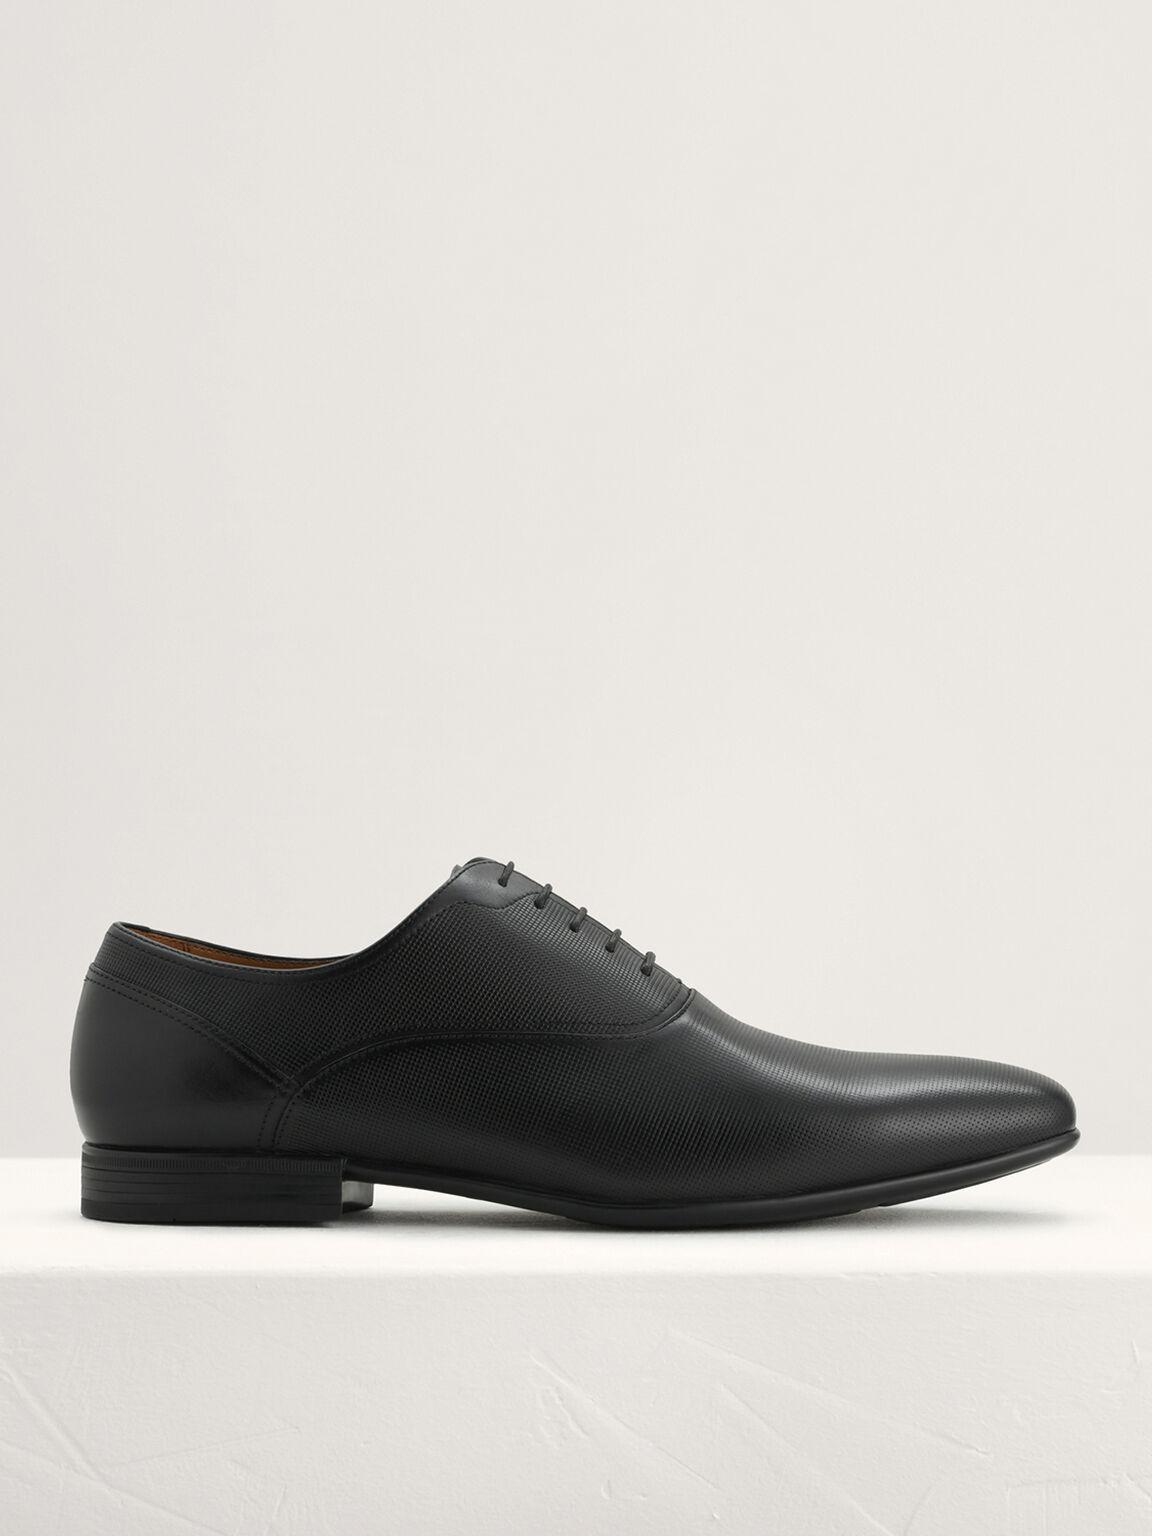 Leather Oxford Shoes, Black, hi-res